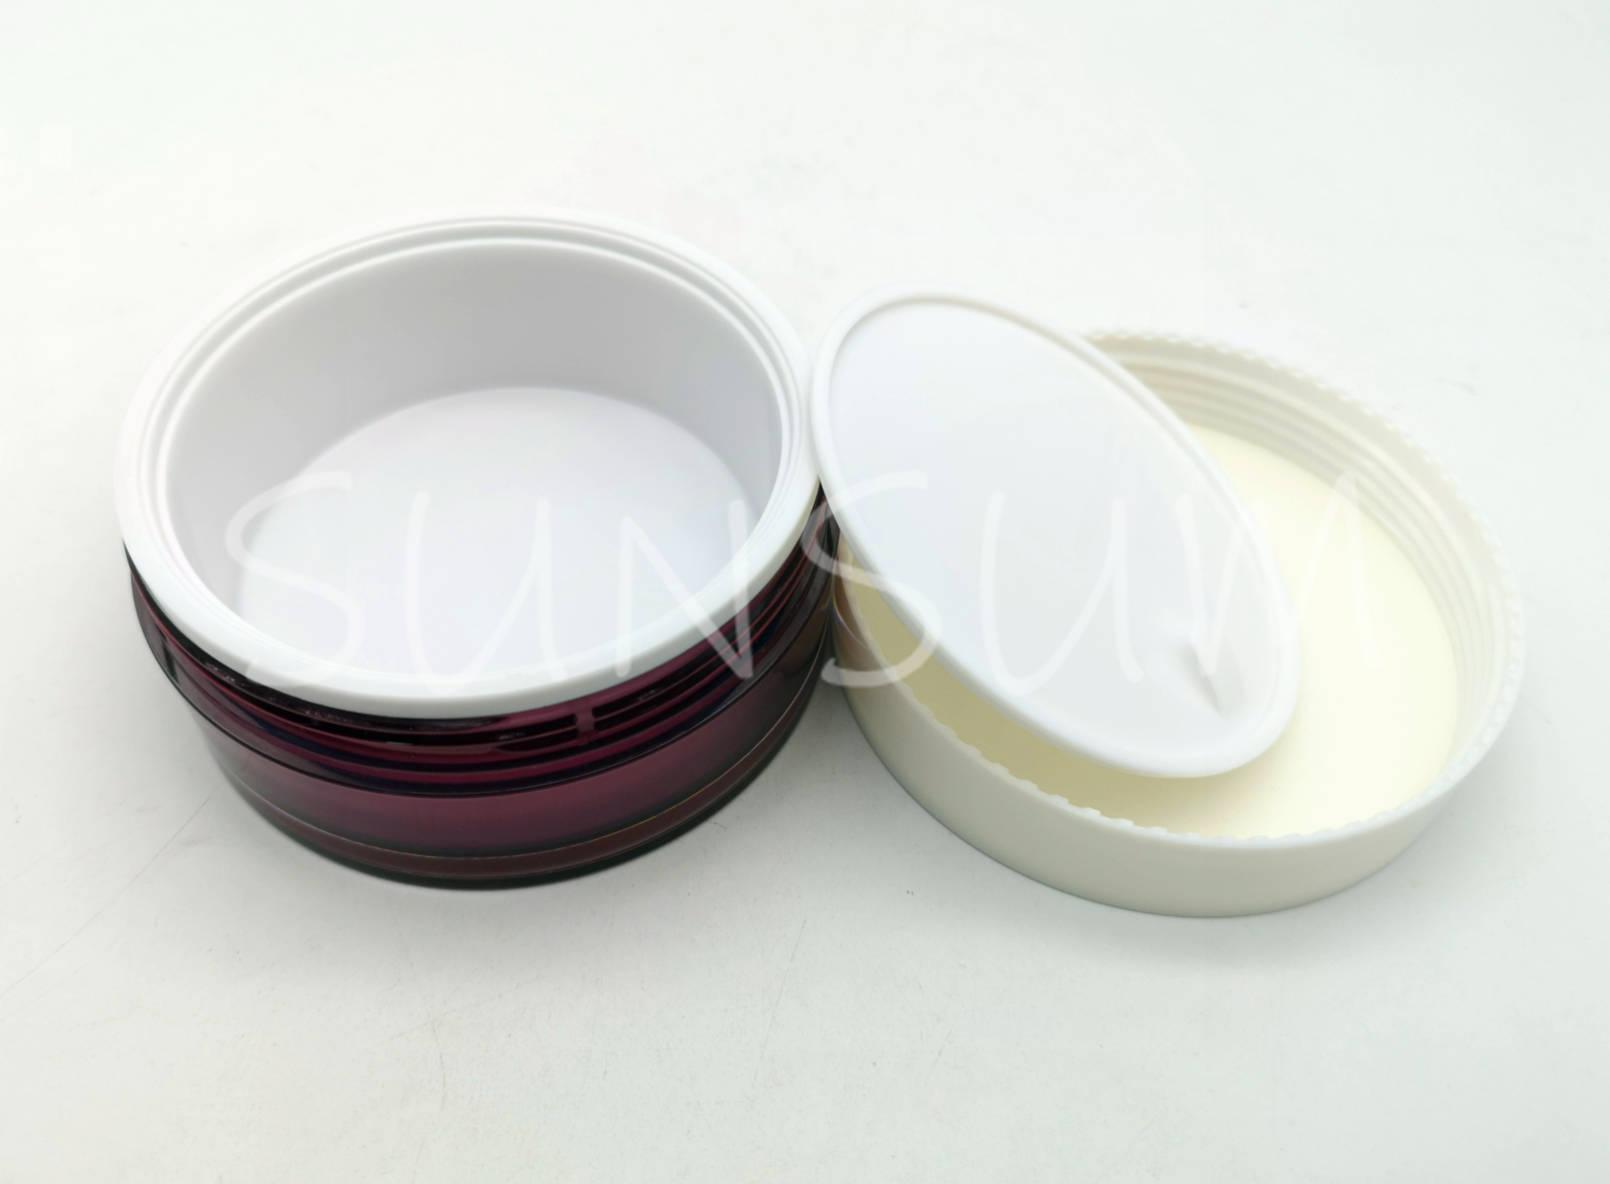 200g cream jar